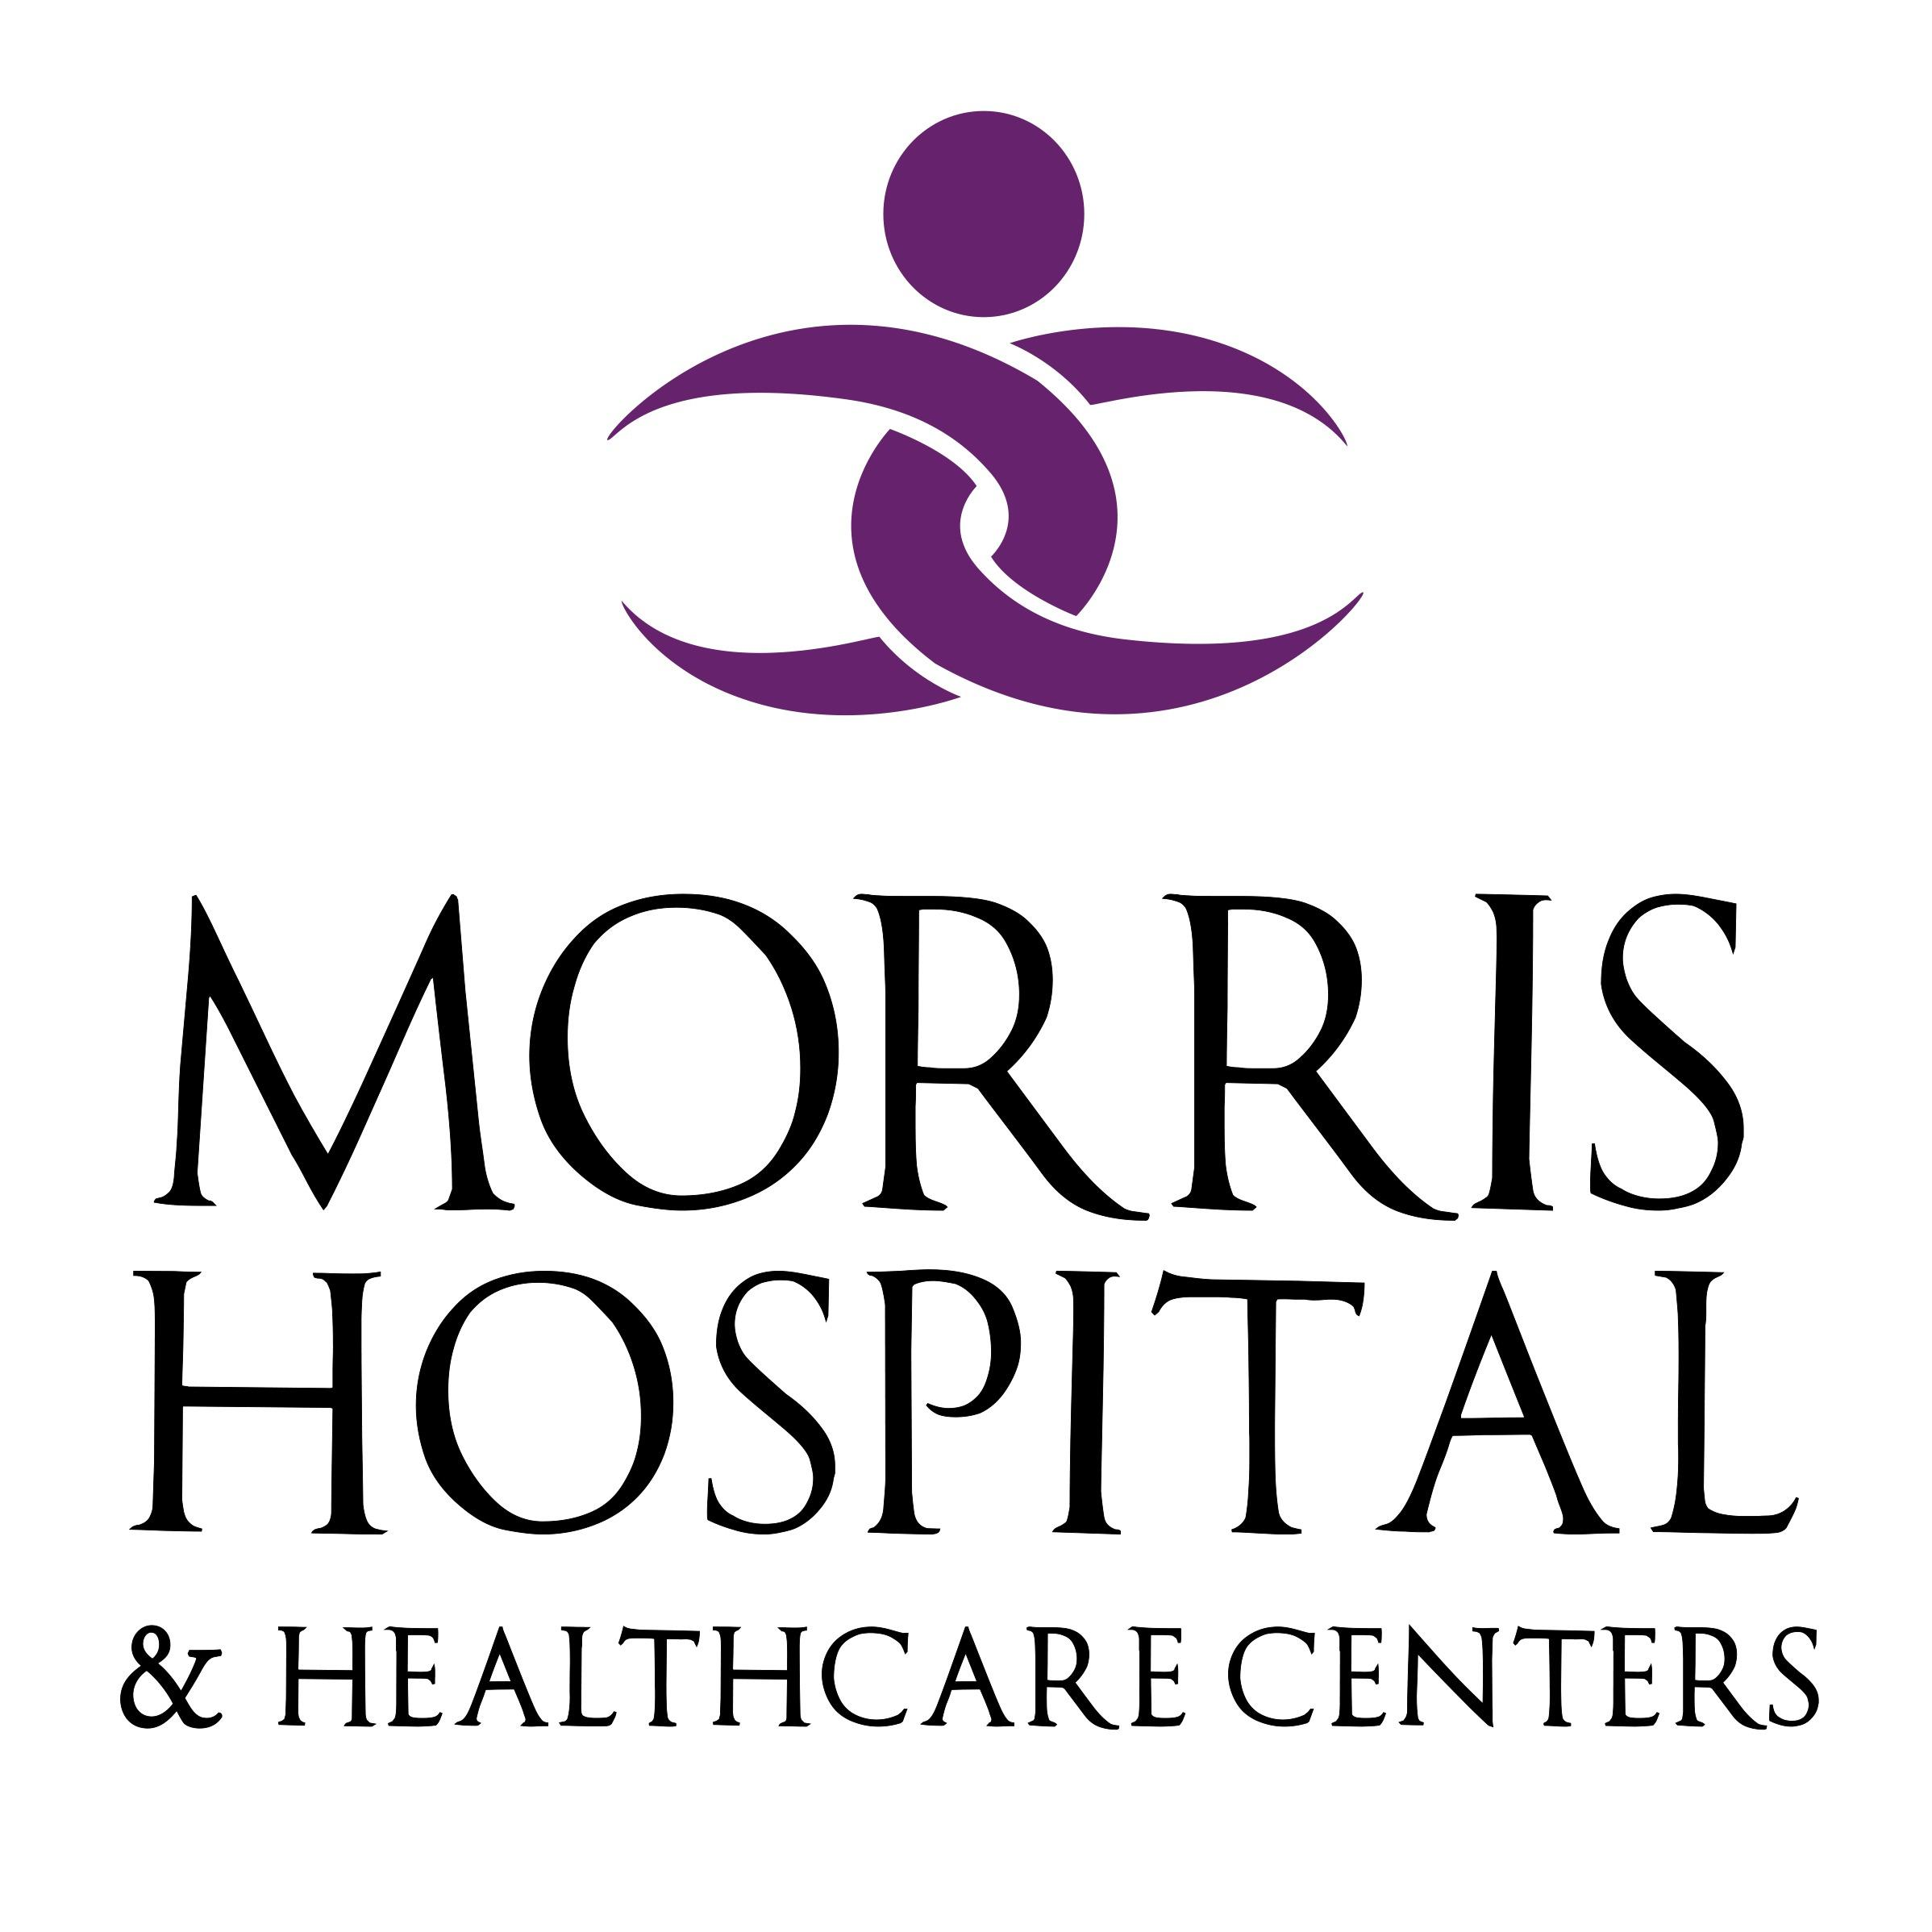 Morris Hospital & Healthcare Centers - Morris, IL - Hospitals